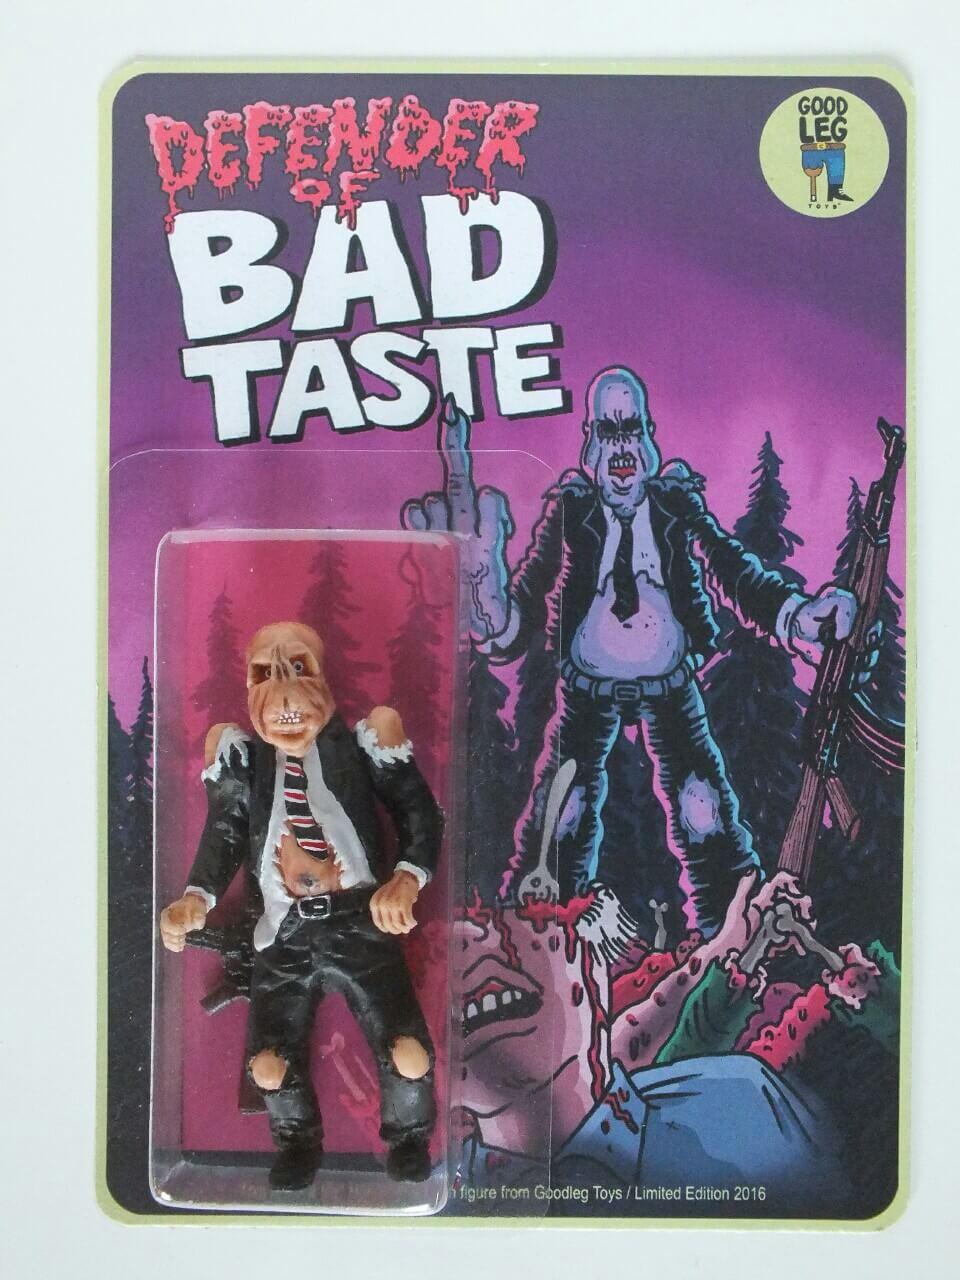 Defender of Bad Taste by Goodleg Toys 1